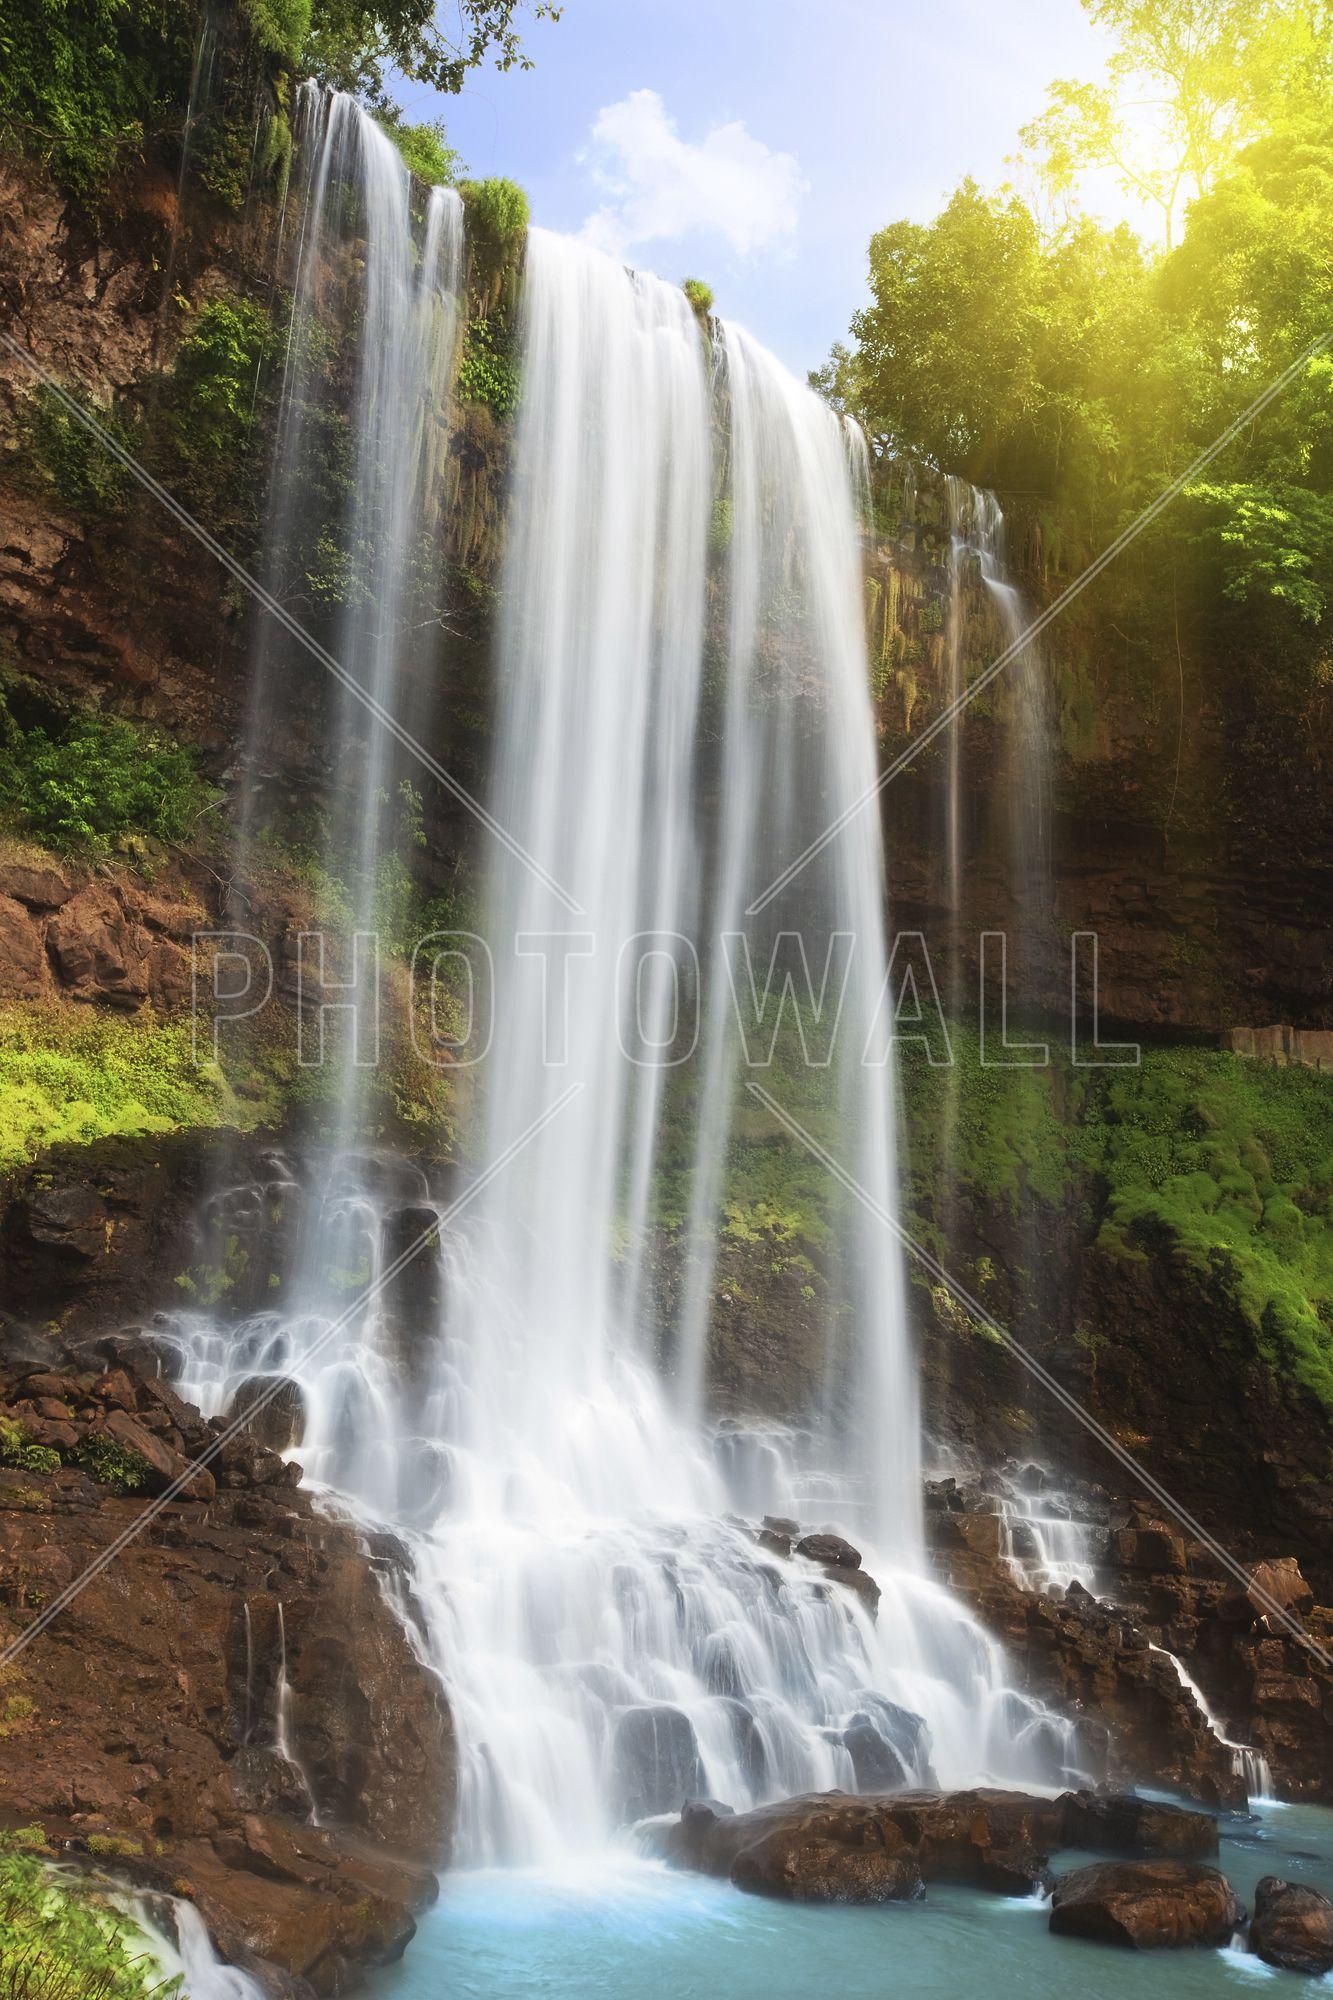 Secret Falls Mural by QuickMurals Waterfall in